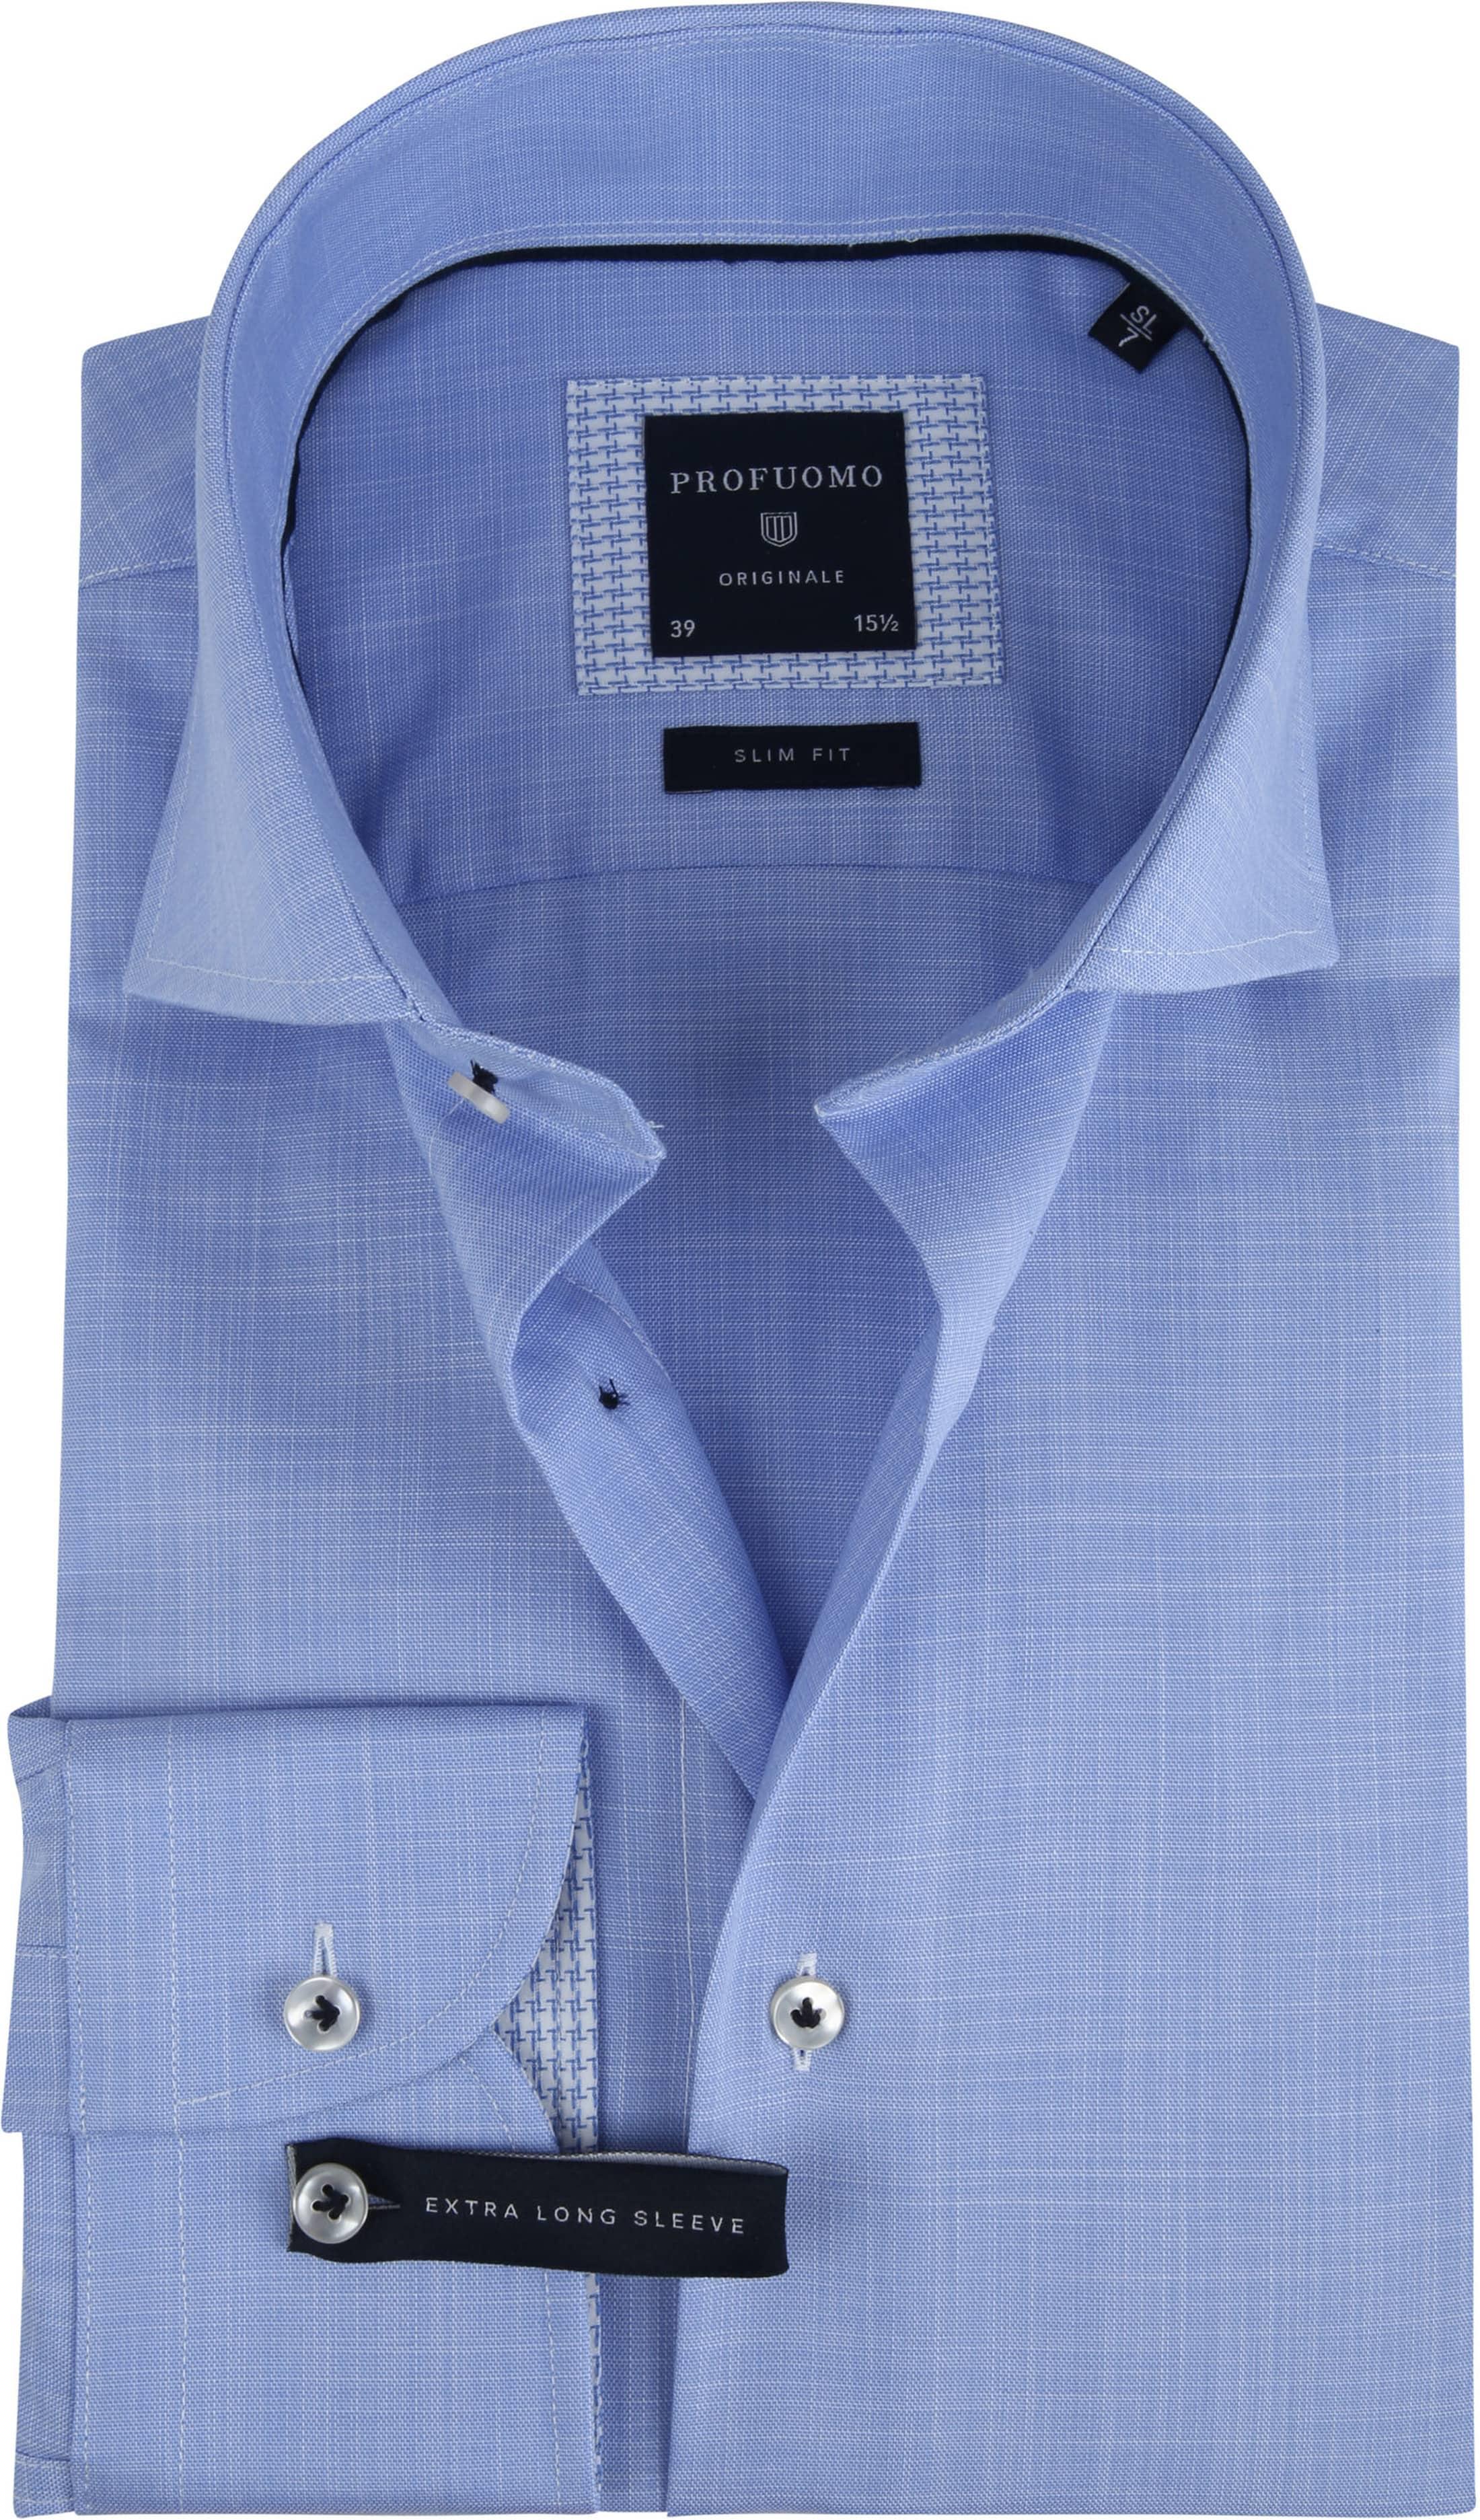 Profuomo Overhemd Melange Blauw SL7 foto 0